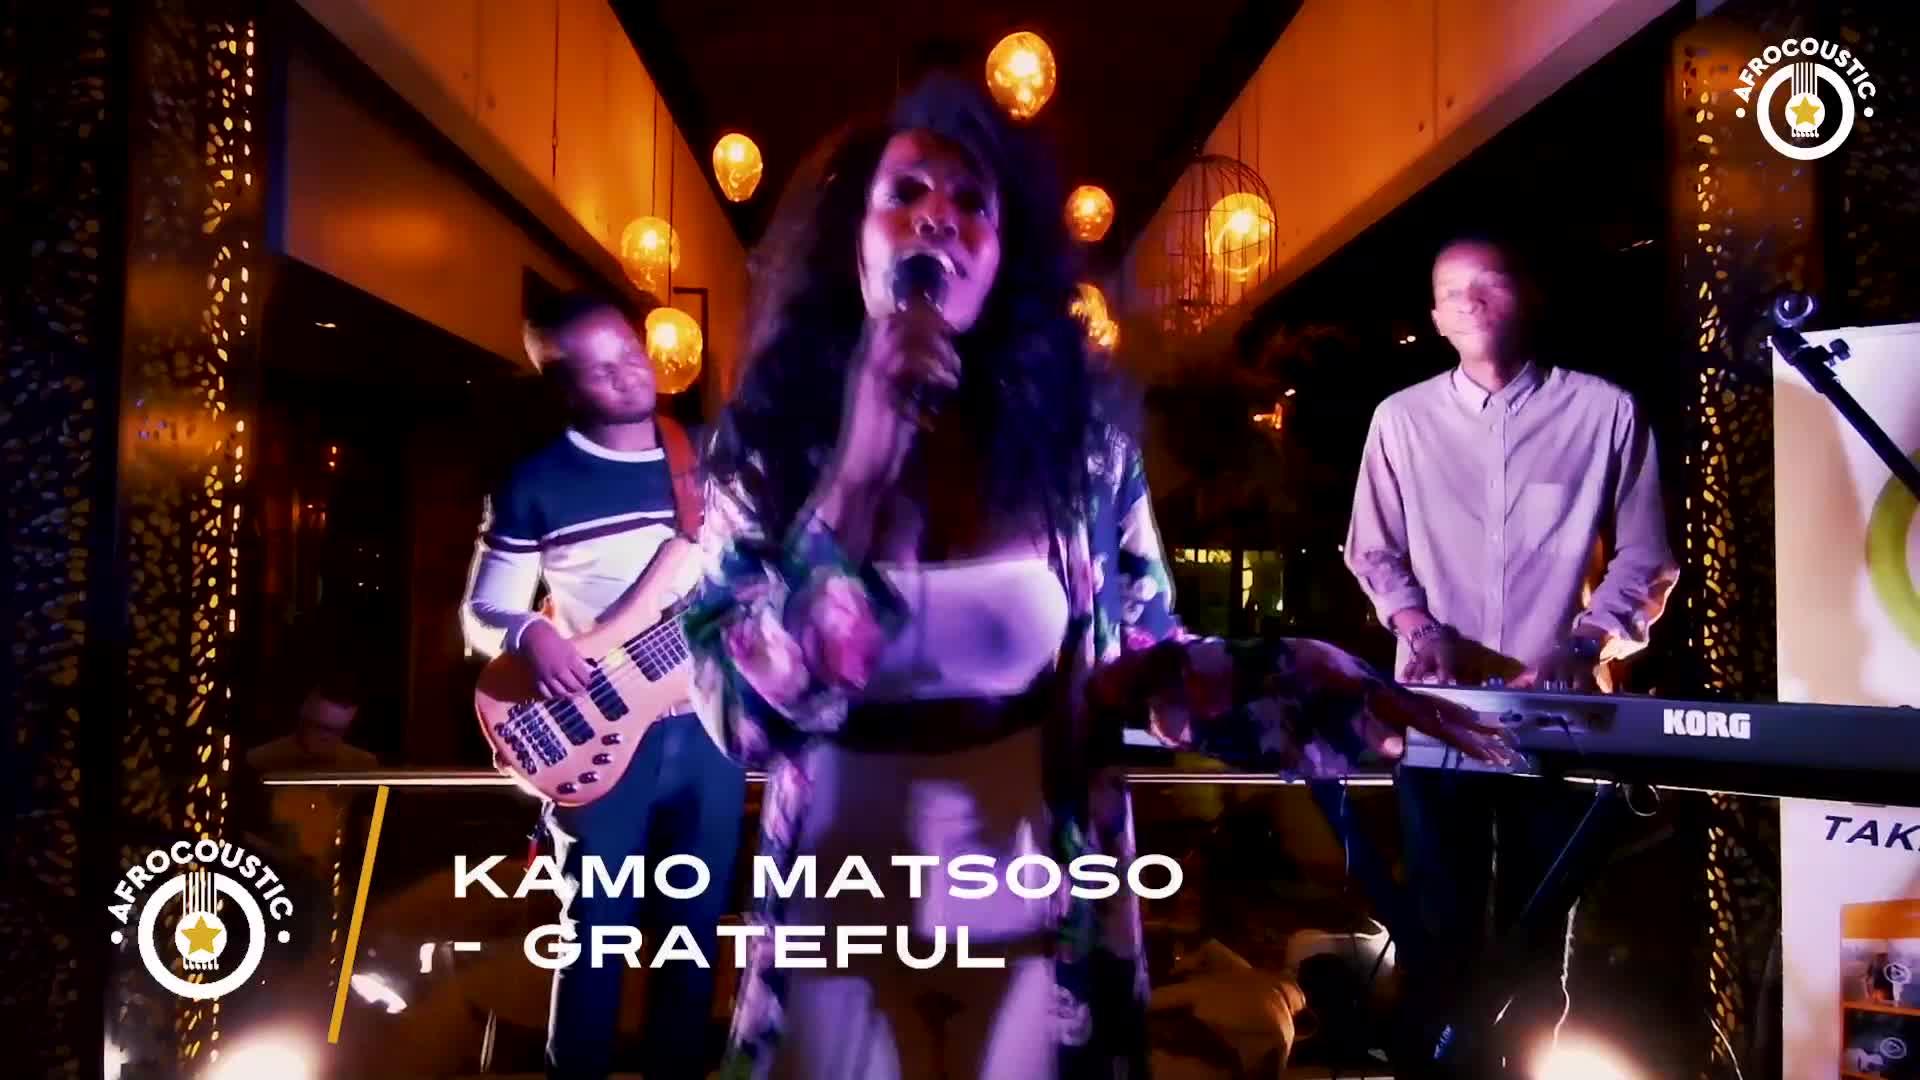 Afrocoustic - Kamo Matsoso - Interview